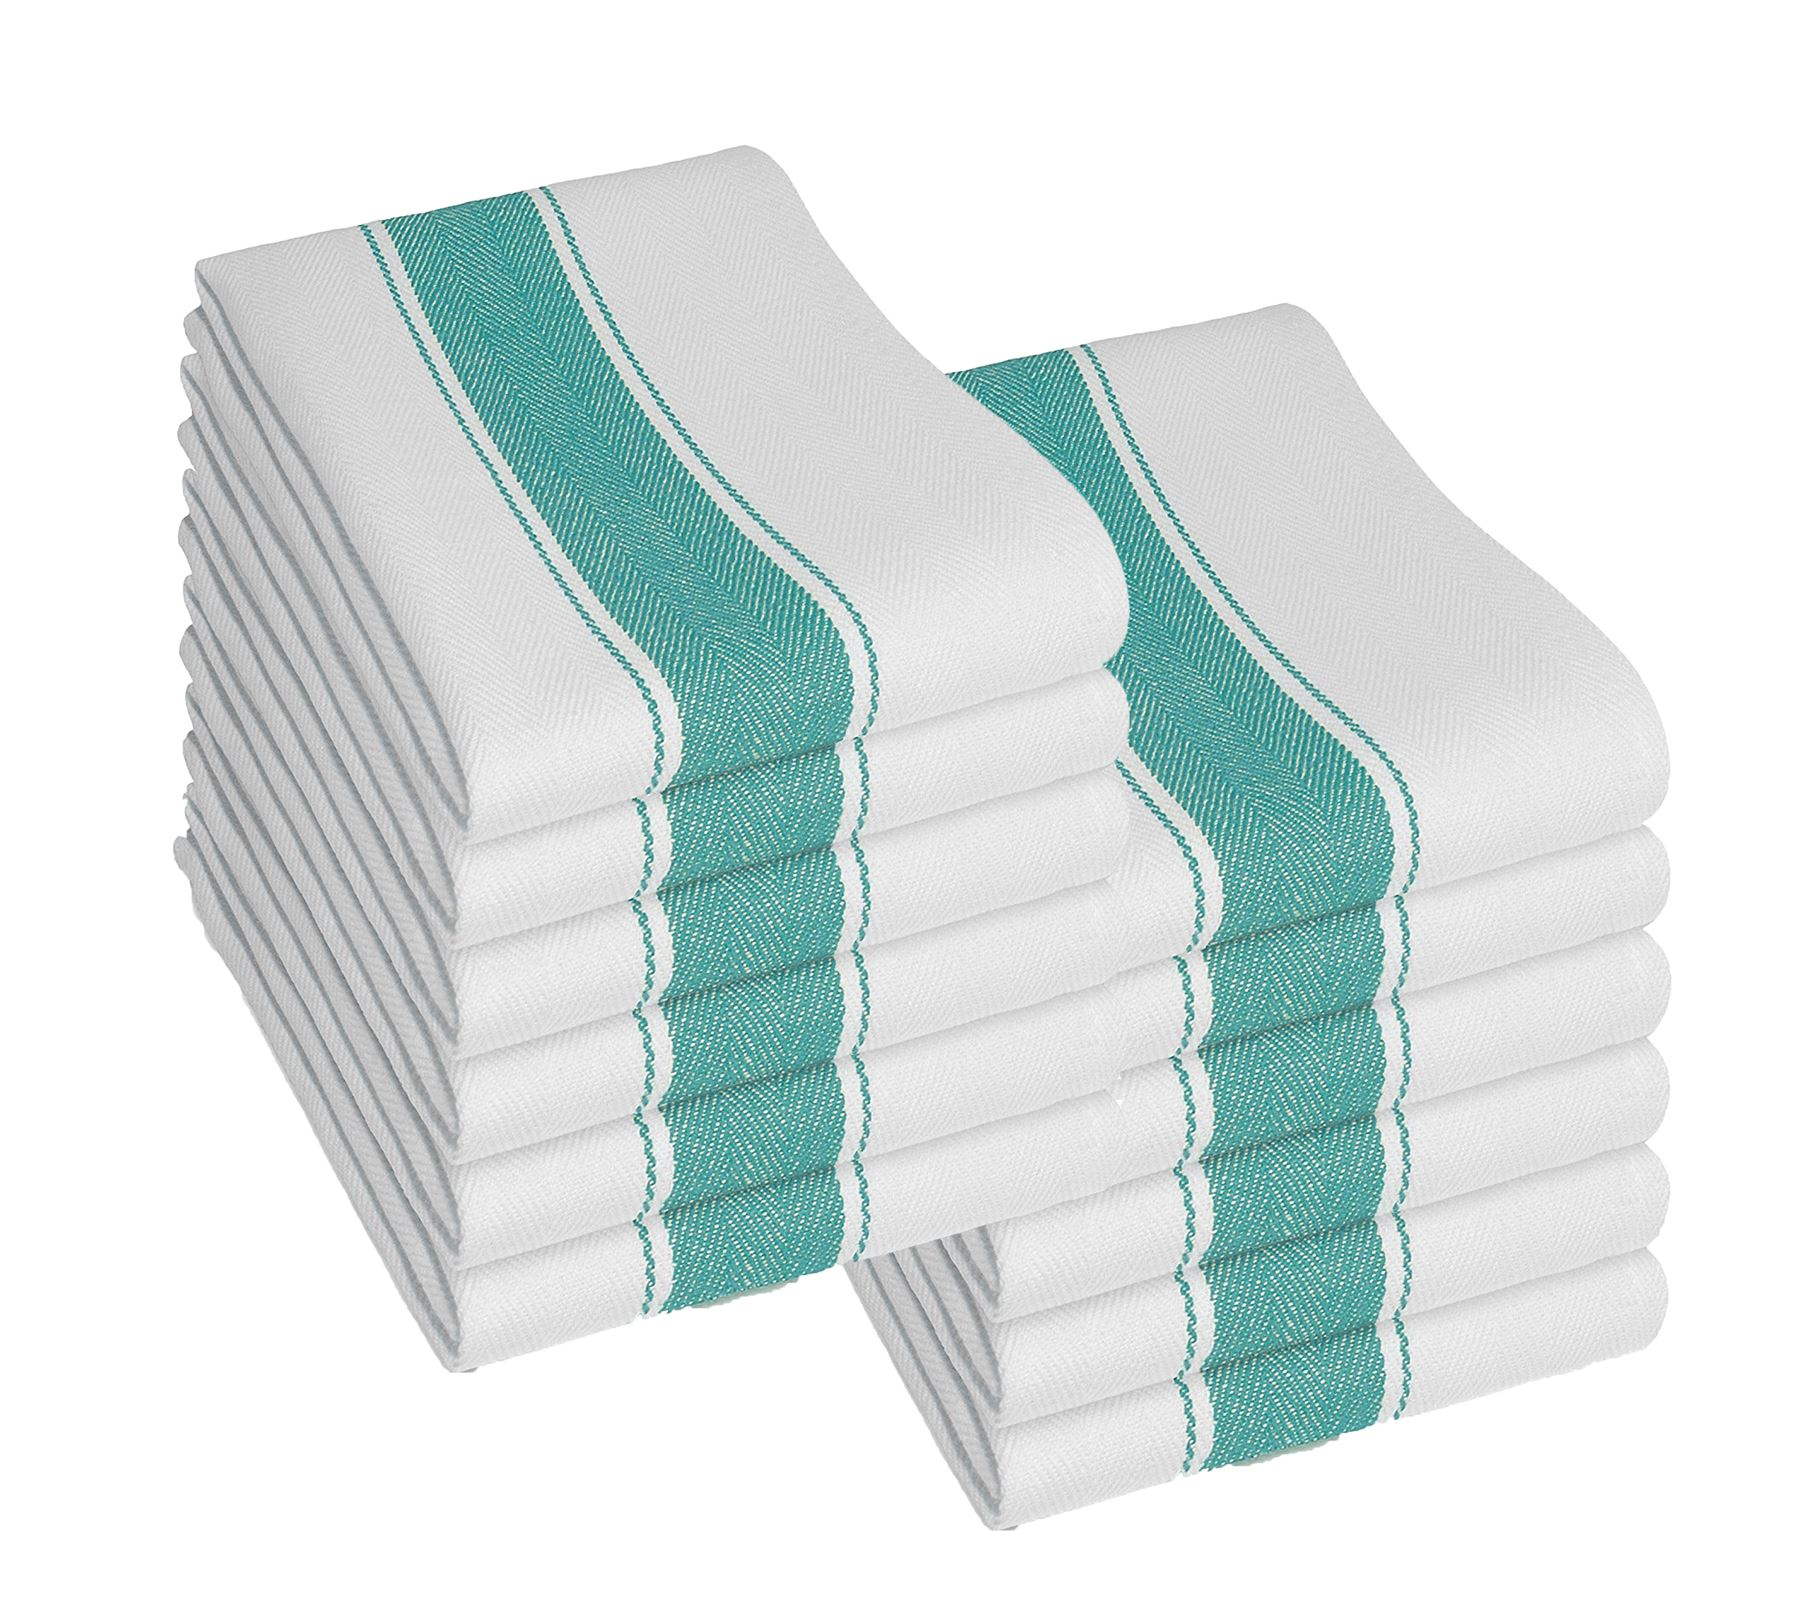 Pack Of 12 Kitchen Tea Towels, Large 100% Cotton Commercial Lint ...